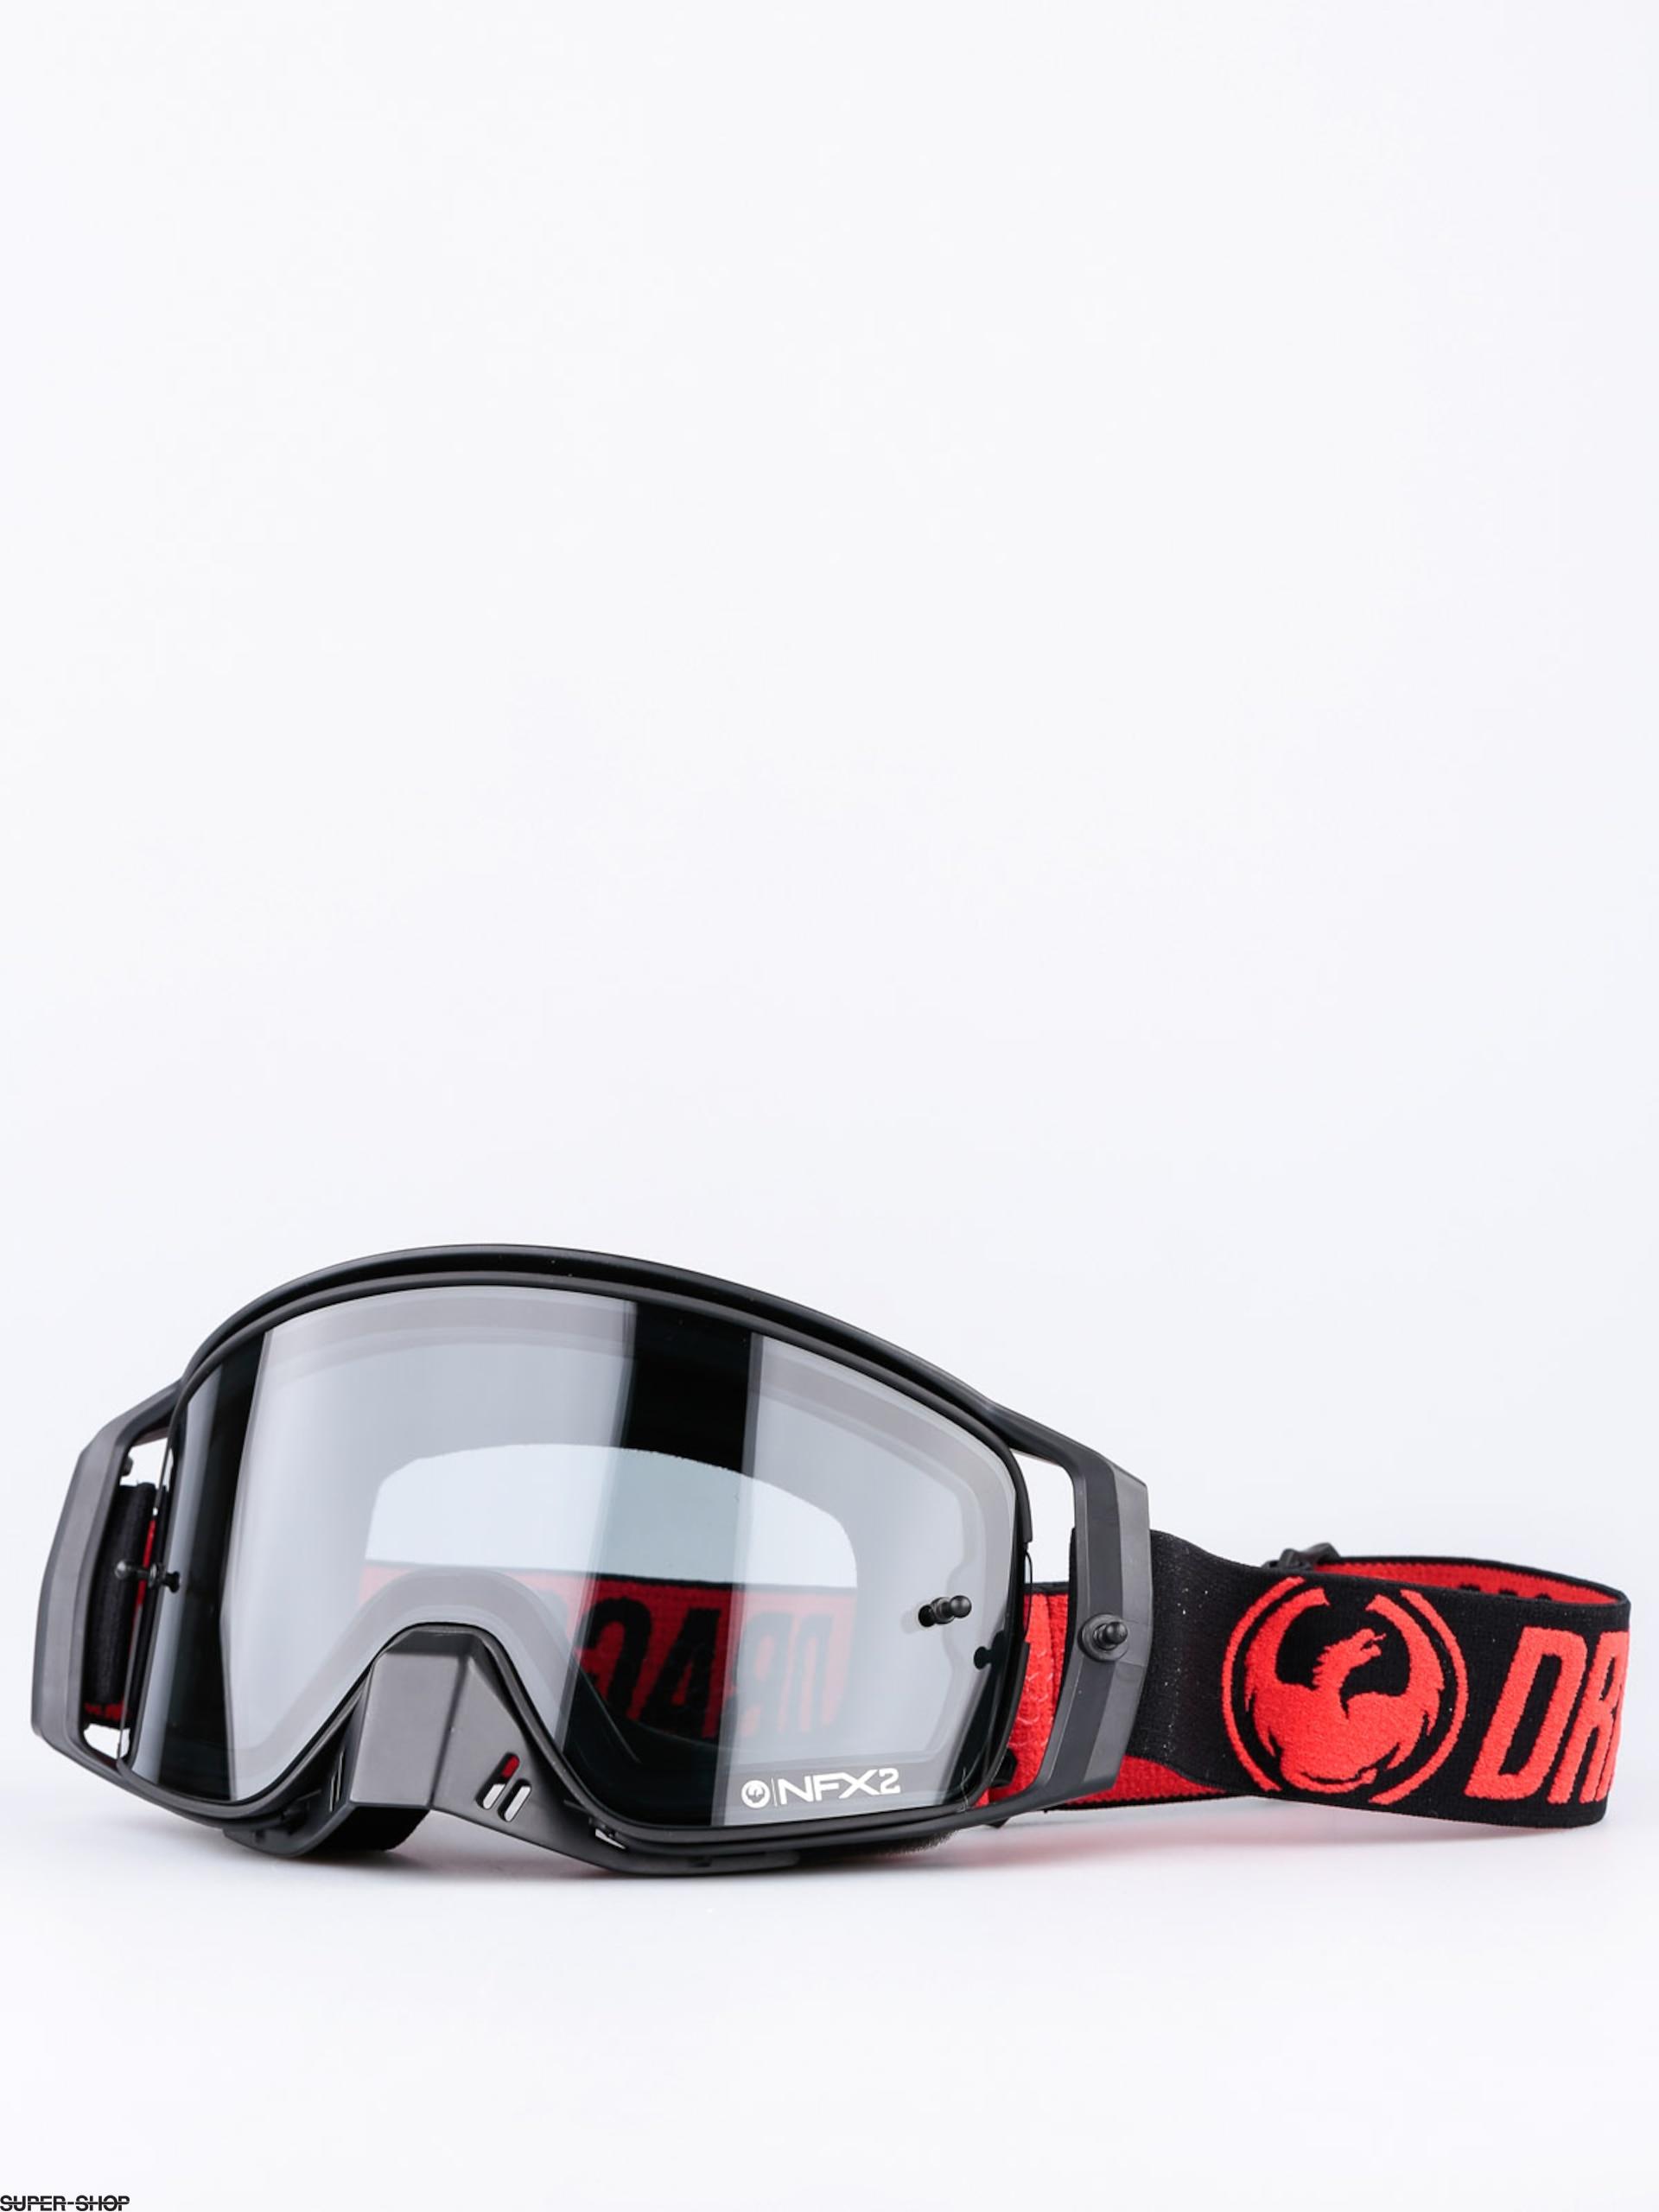 46c8ee8f9 819761-w1920-dragon-cross-goggles-nfx2-red-inj-smoke.jpg